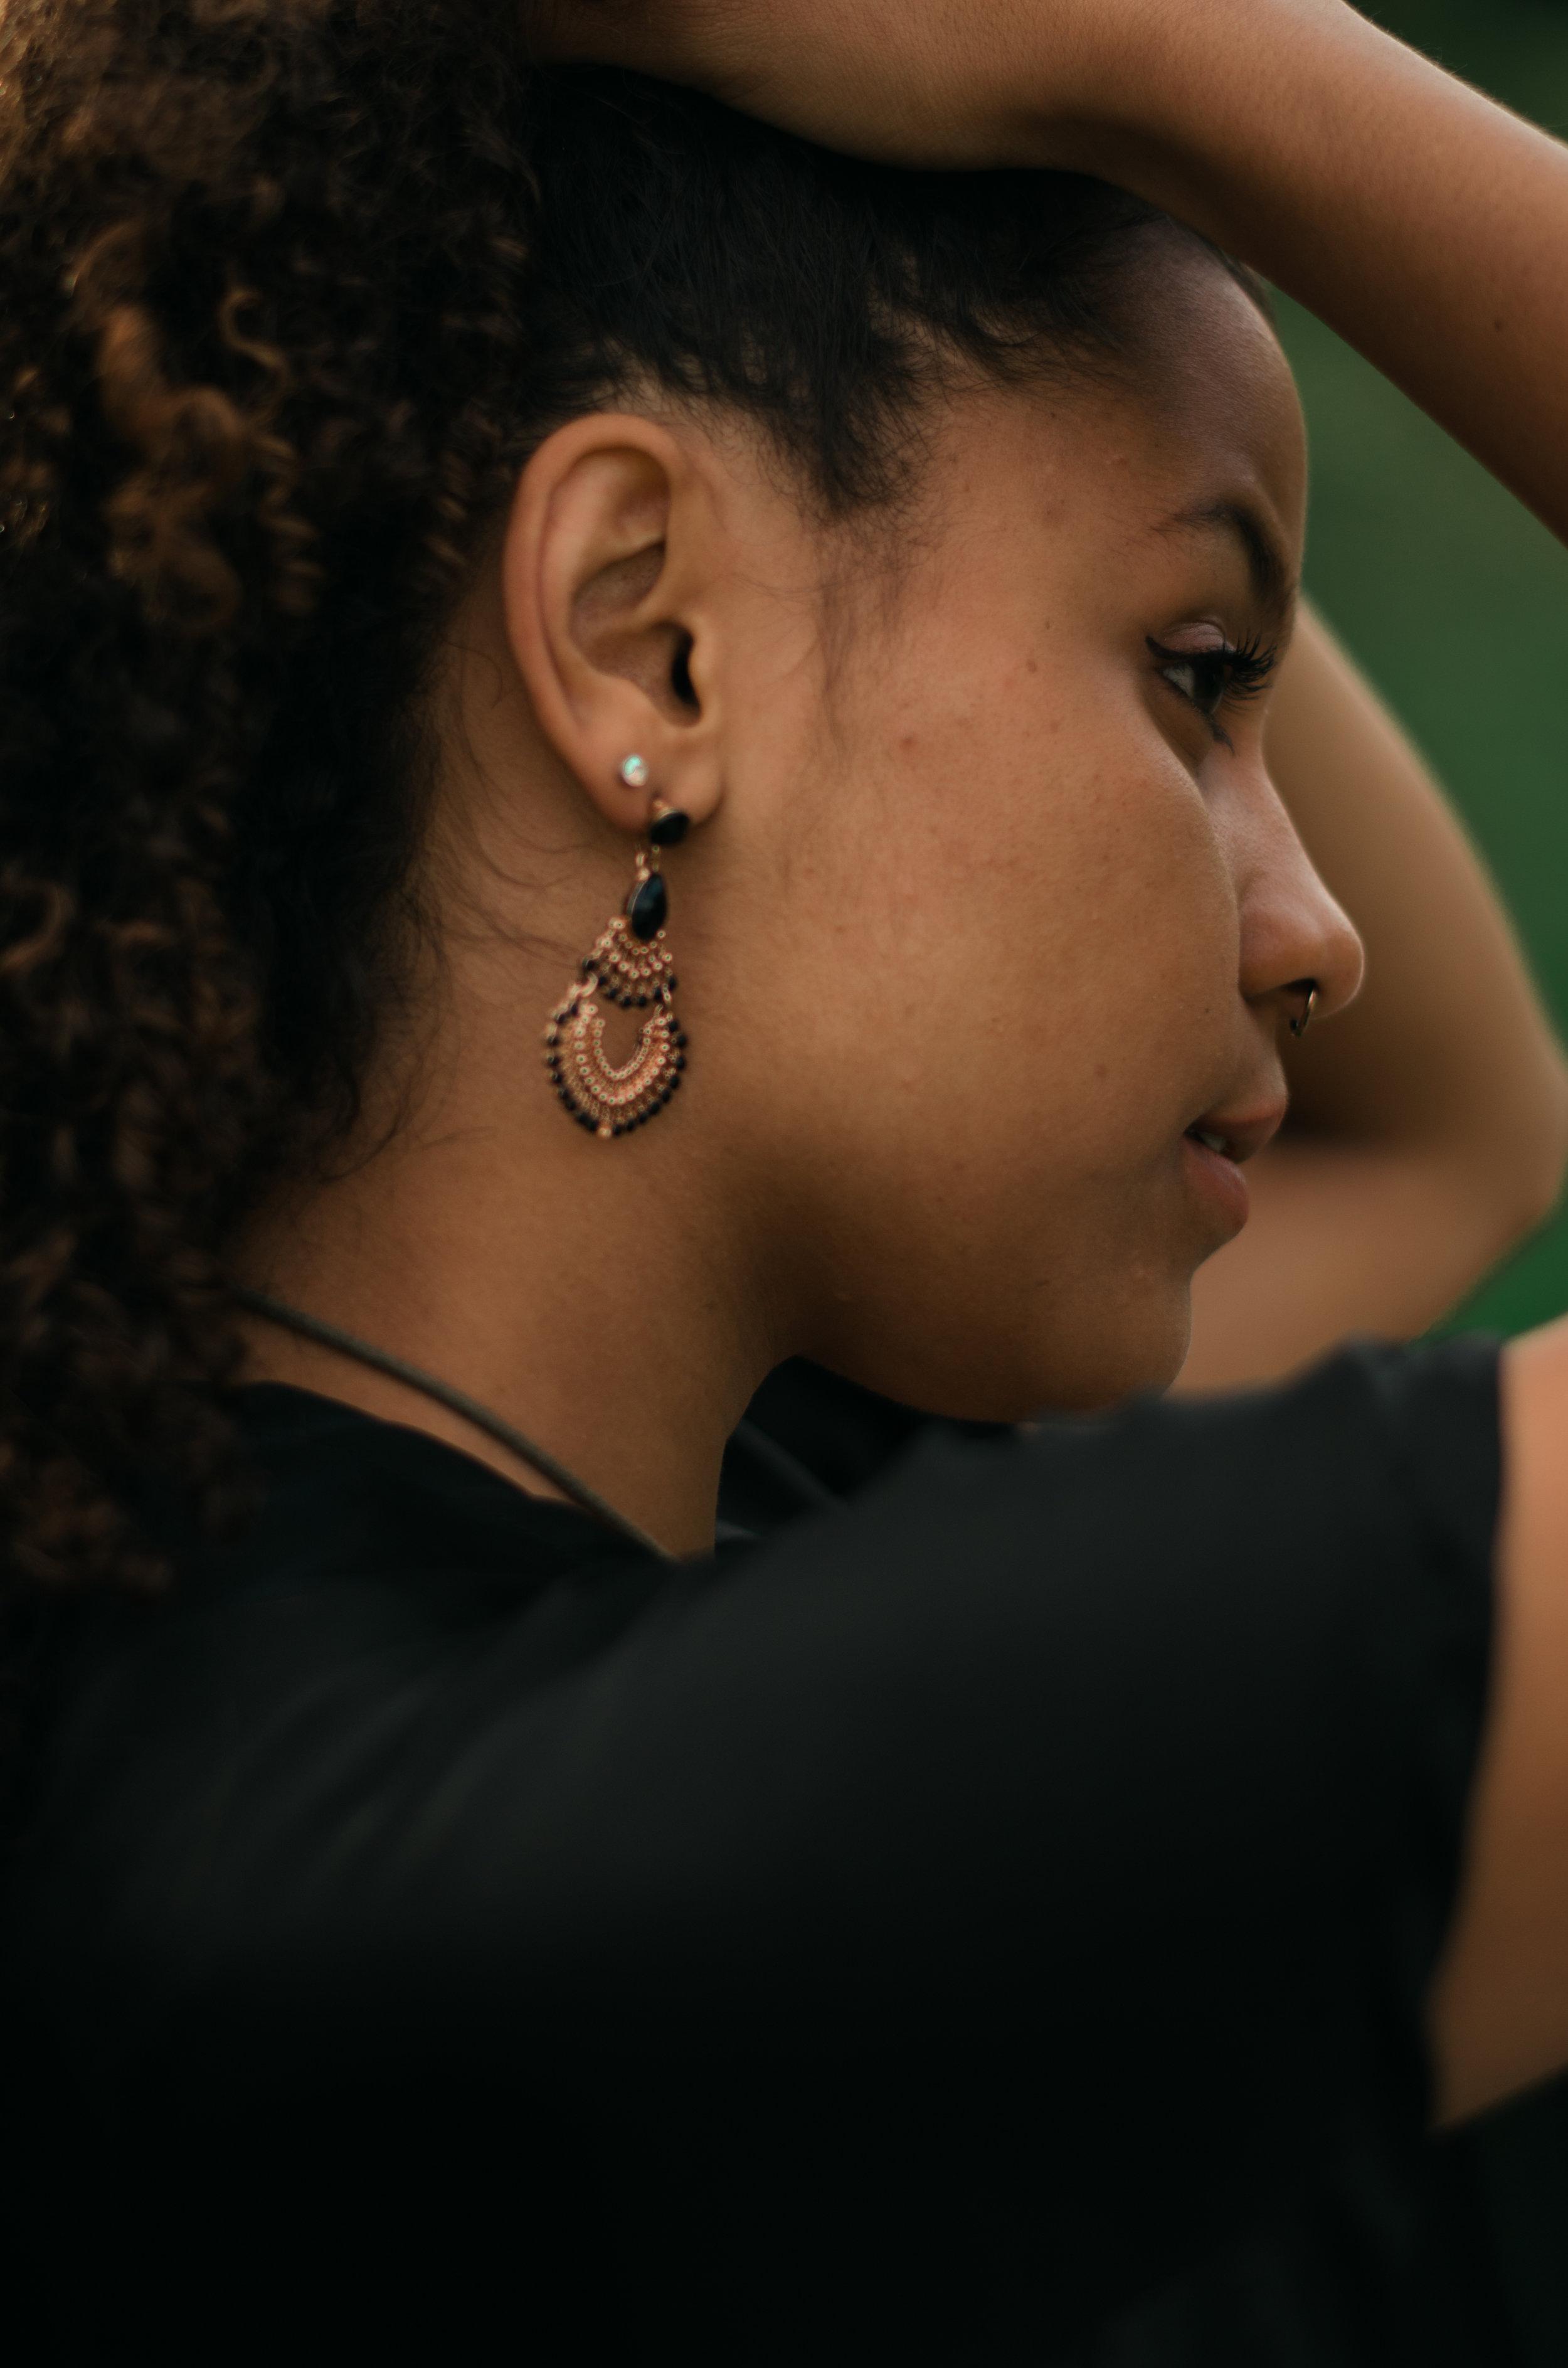 Inka-Portrait-Session-Aiste-Saulyte-Photography-17-07-30-233.jpg